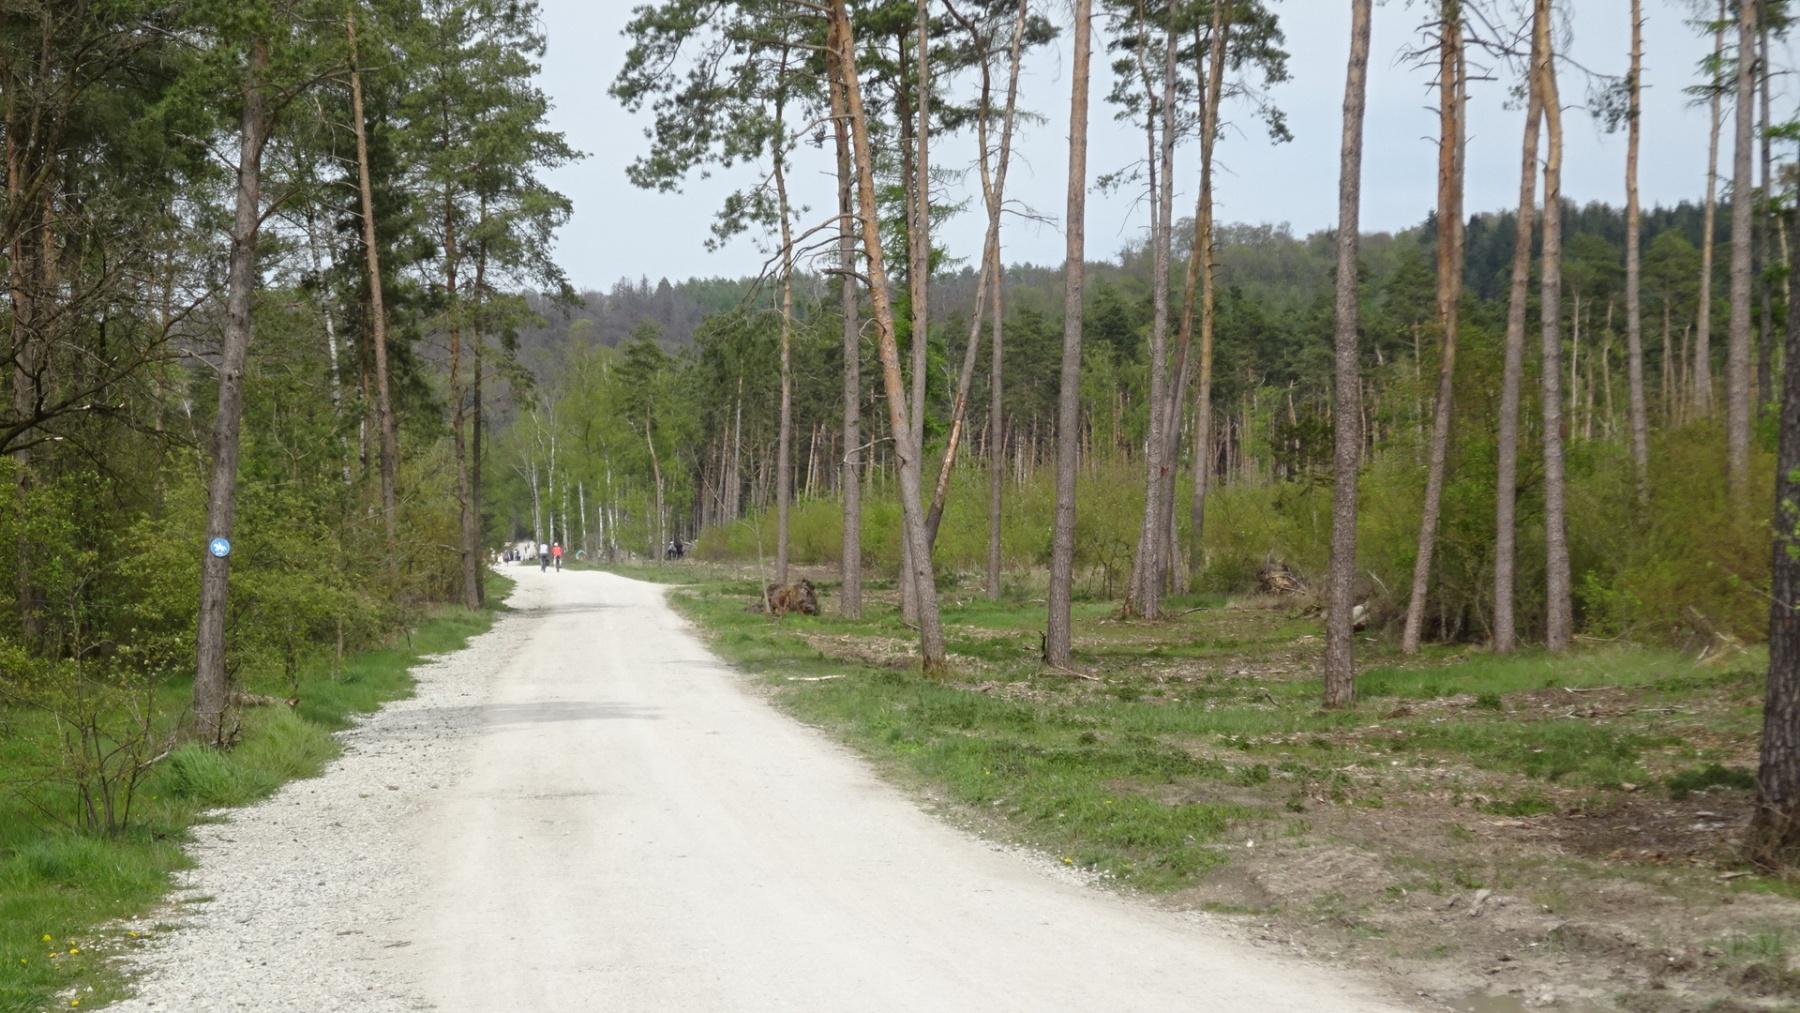 Brechmann-Frank-17-Challenge-Nature-Run-xz9ge